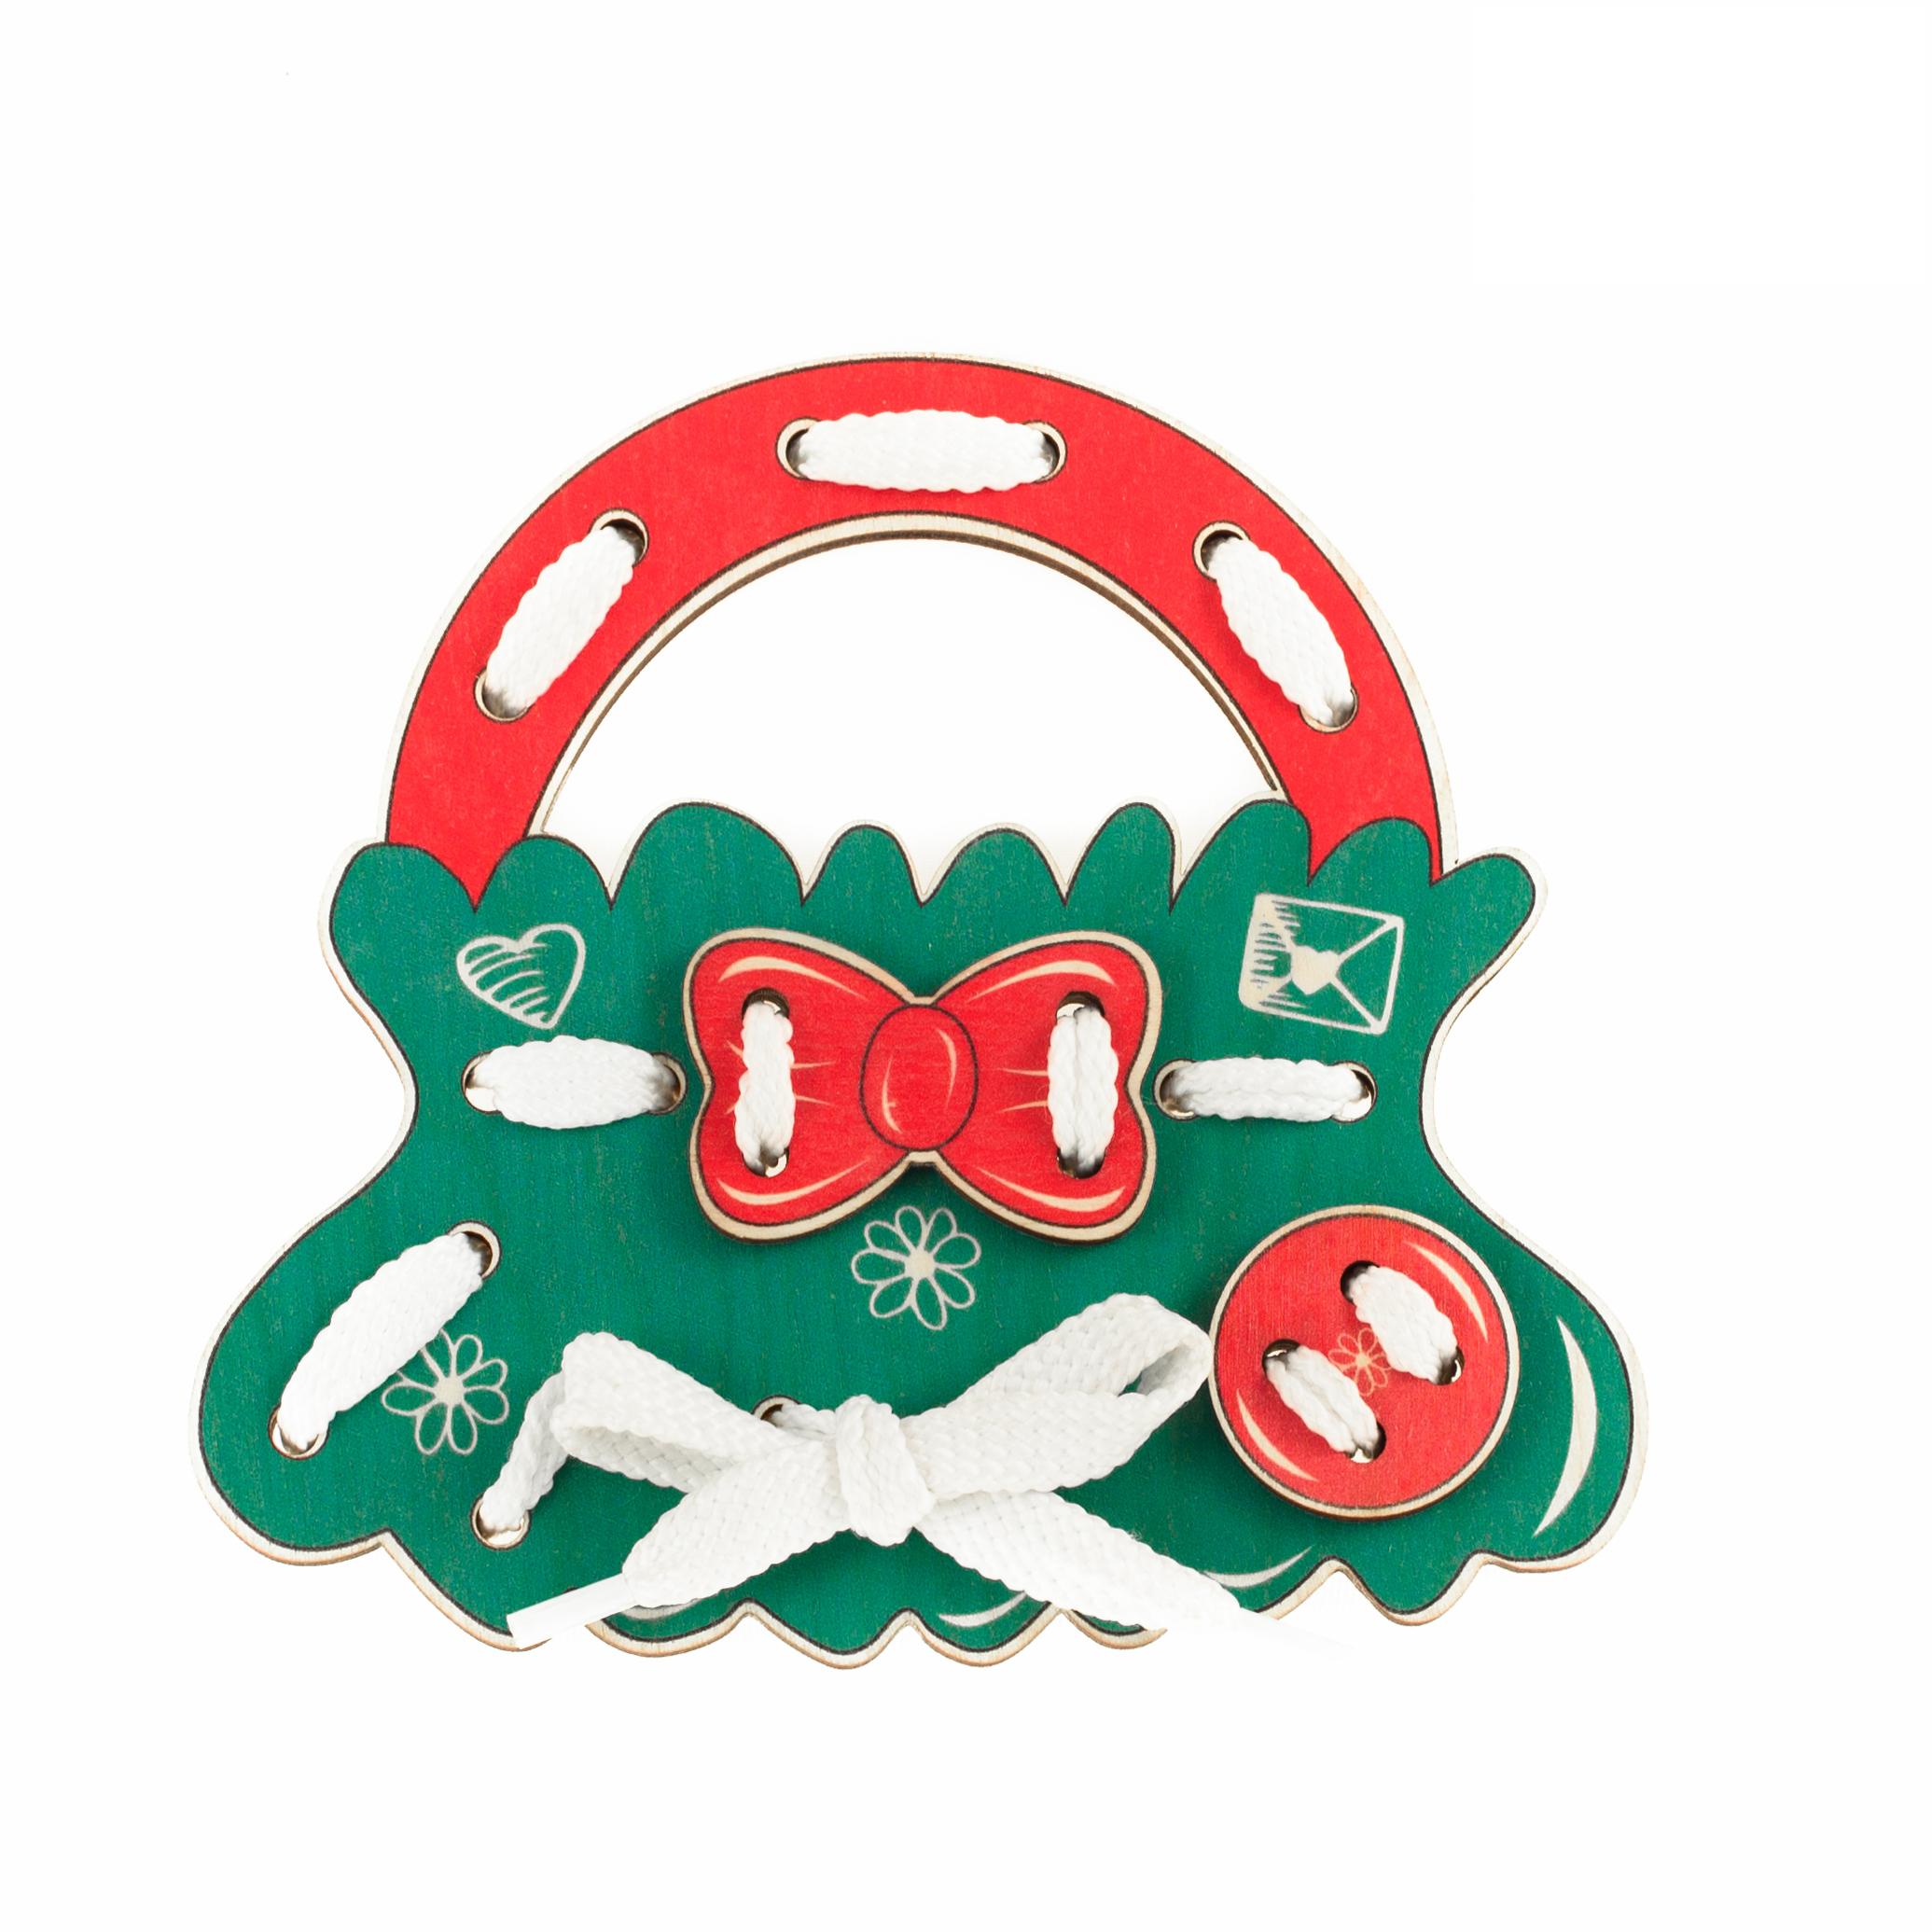 Шнуровка Анданте Д475а красный, зеленый